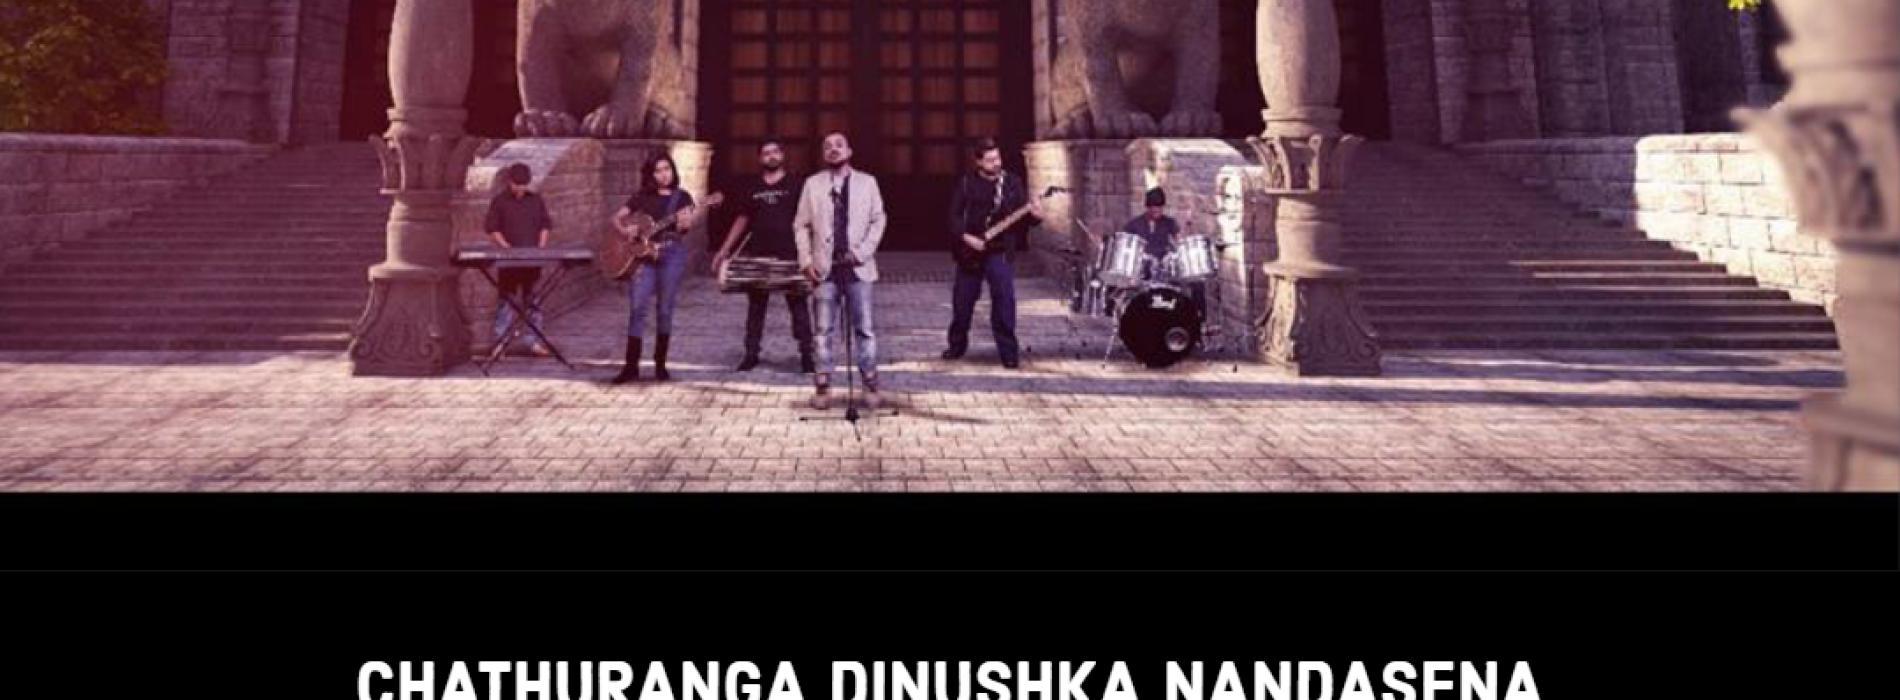 Chathuranga Dinushka Nandasena – Borukara Thol Eththi Official Music Video (බොරුකාර තොල් ඇත්ති)